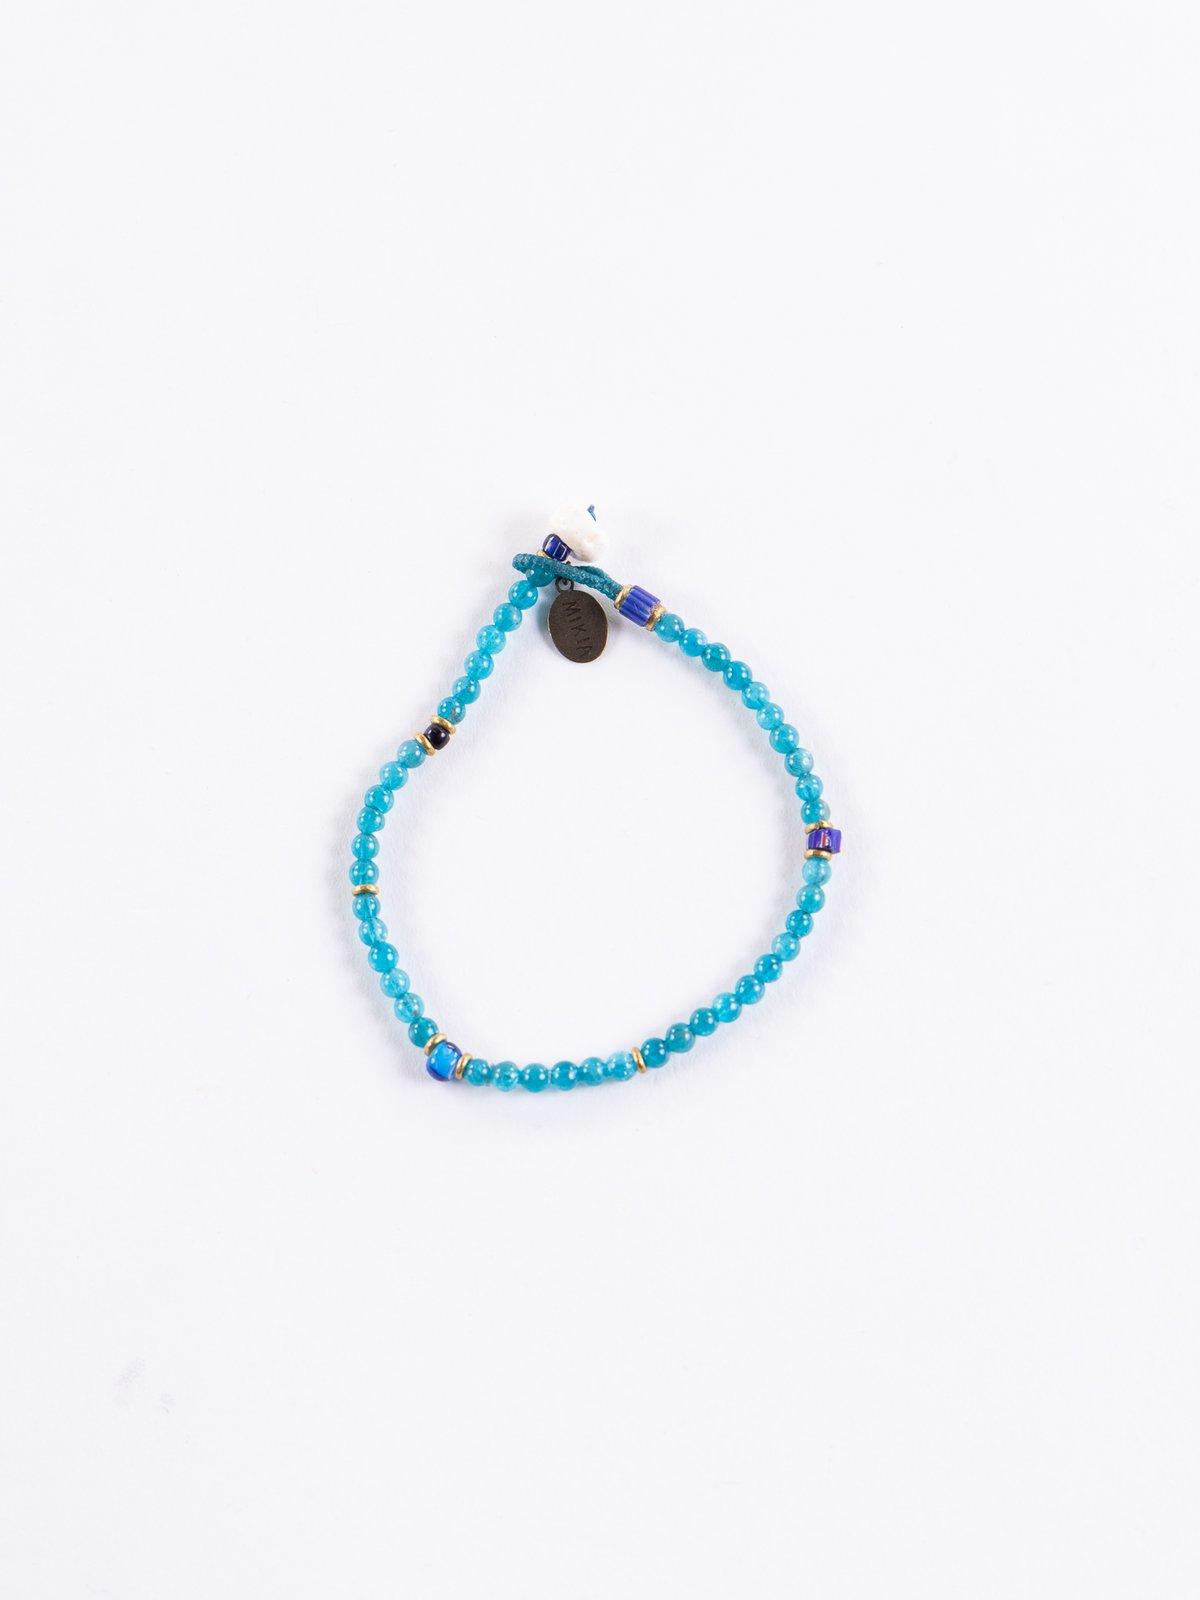 Apatite 4mm Bracelet - Image 1